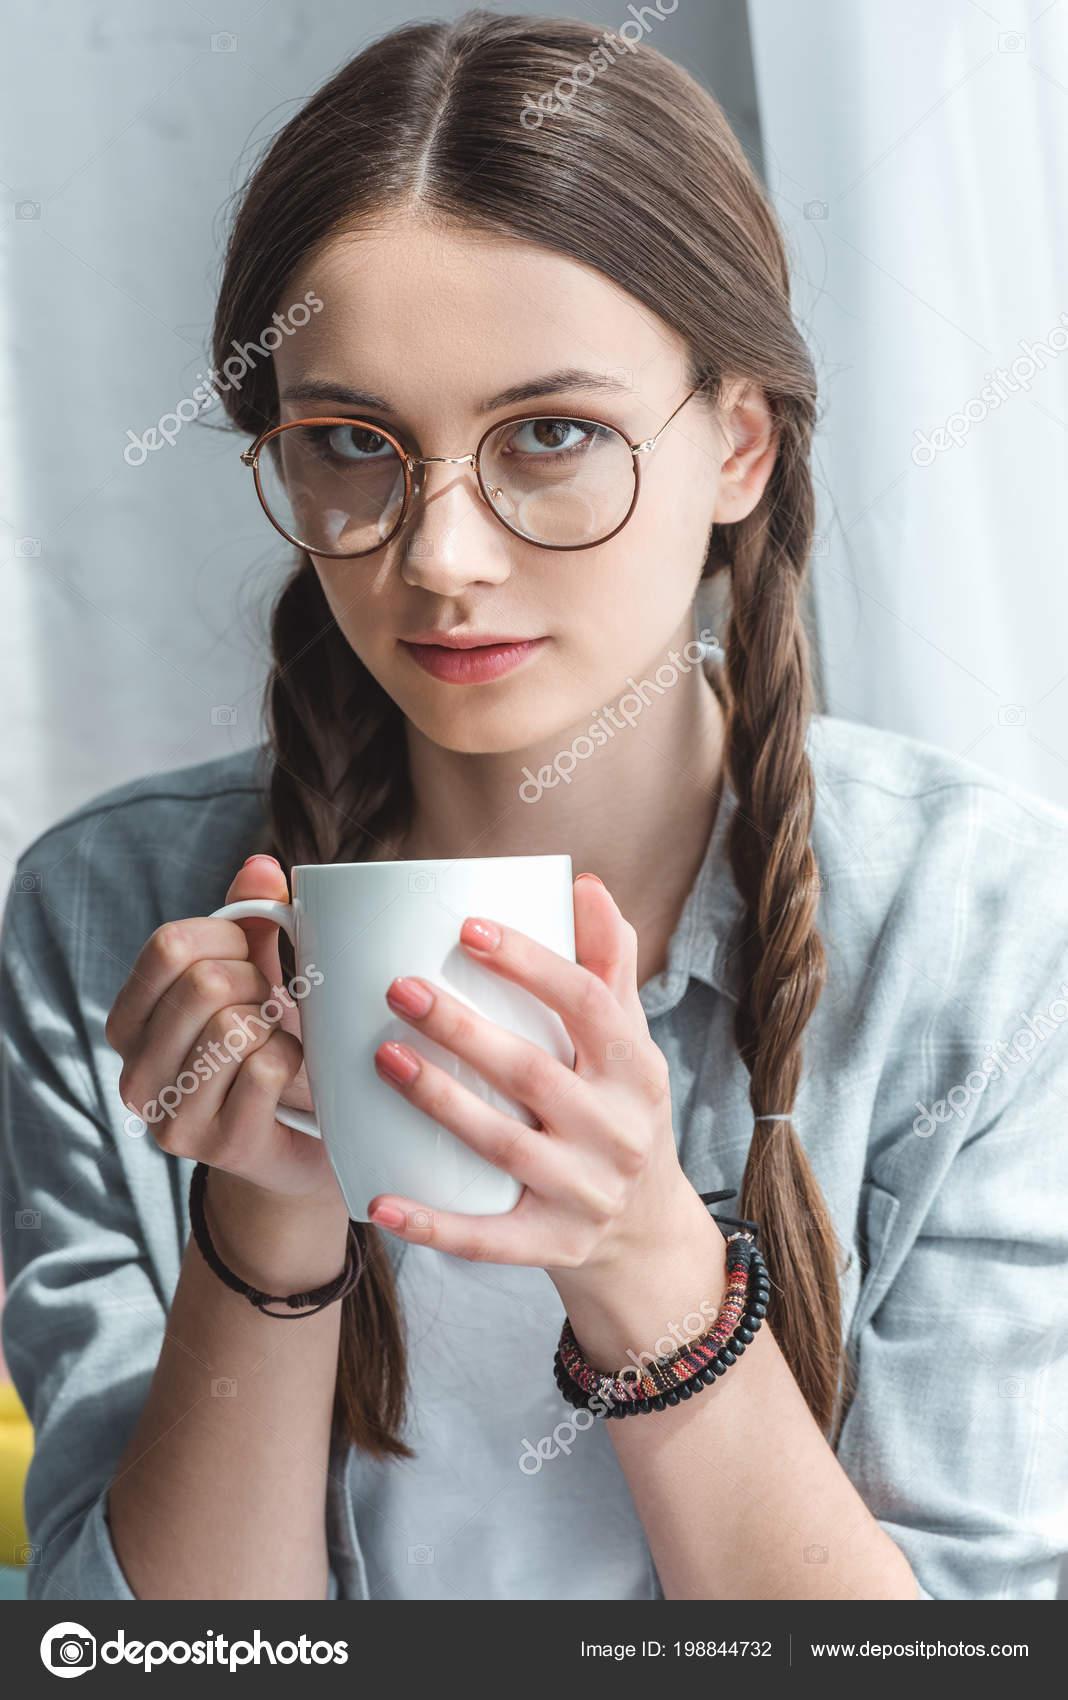 aa3b7ce6553c Attractive Teen Girl Eyeglasses Drinking Coffee — Stock Photo ...